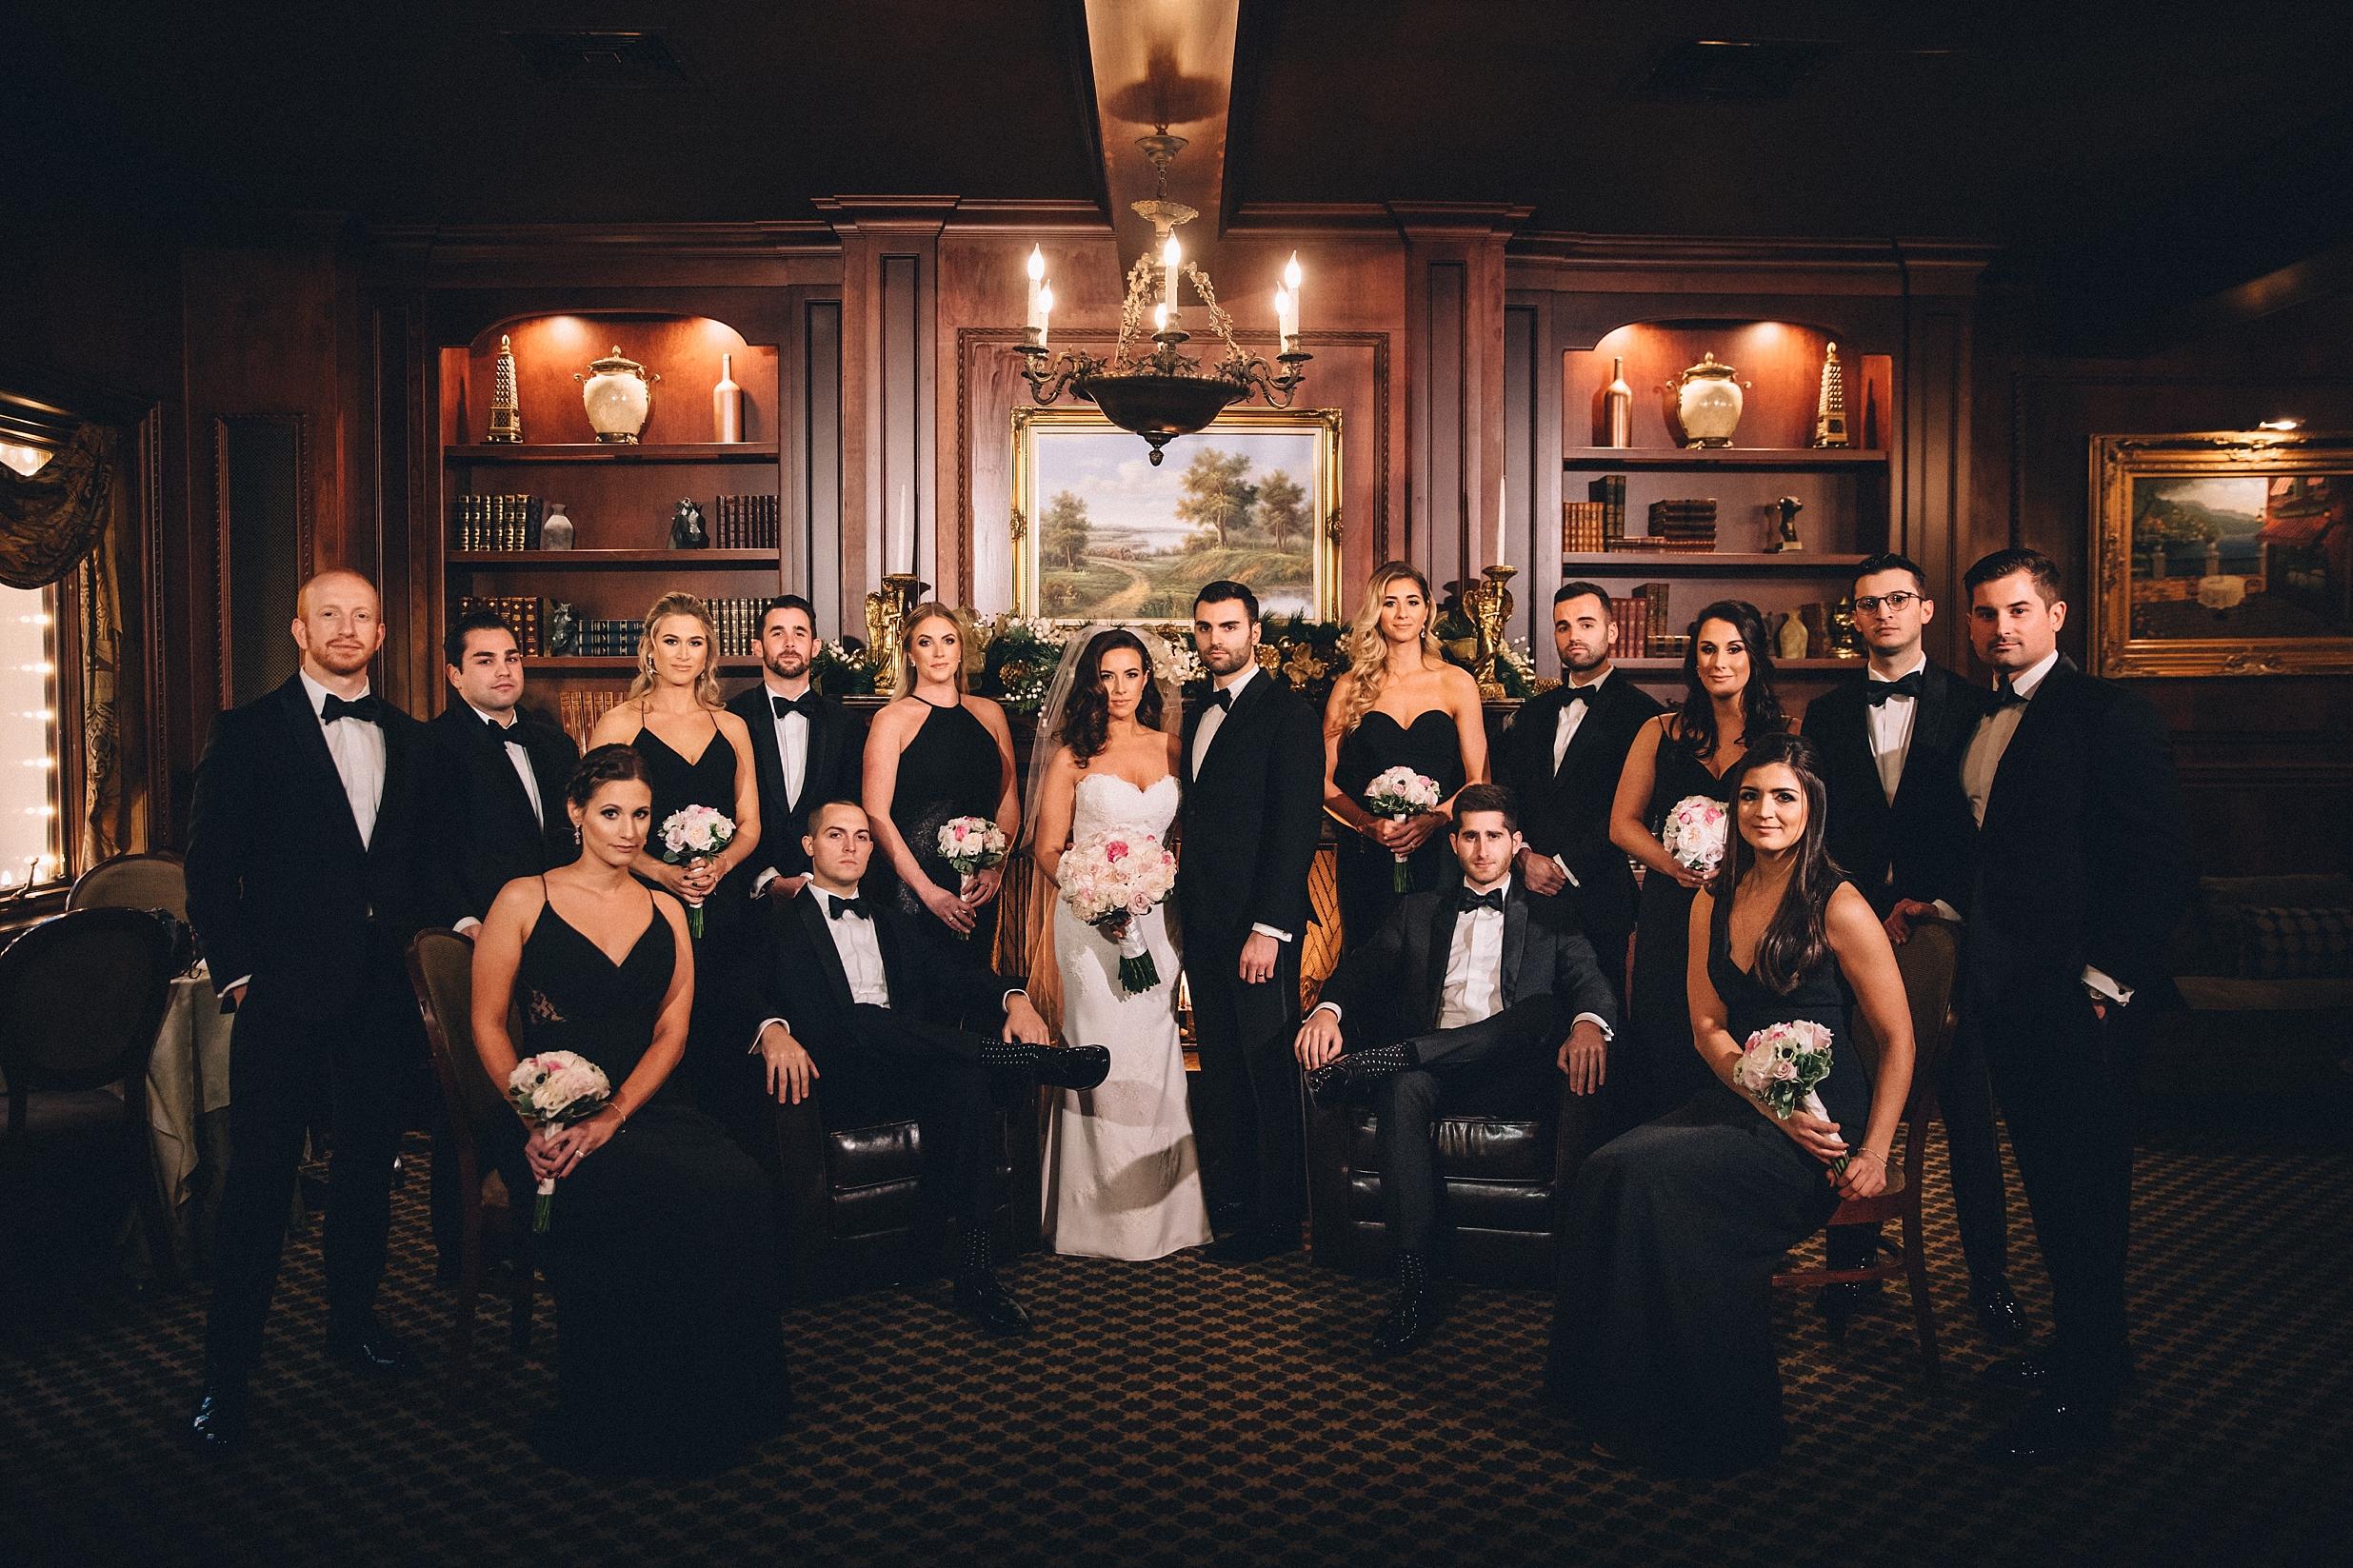 winter-wedding-snow-indoor-ceremony-nj-photographer_0021.jpg